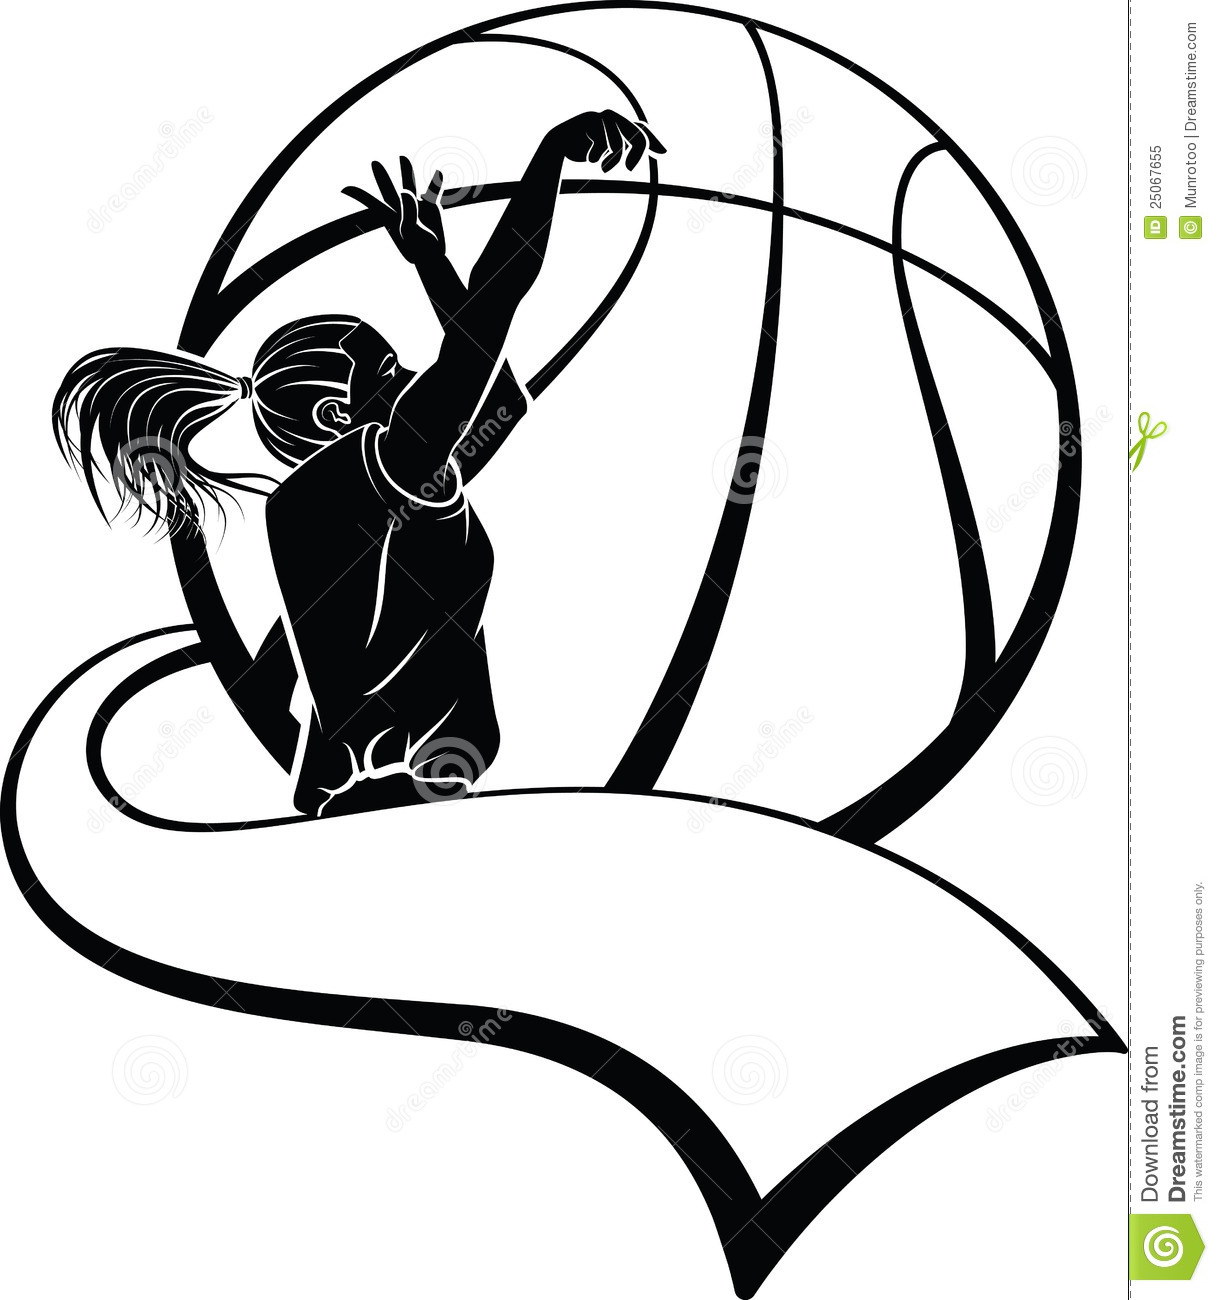 Basketball clipart clipart clip transparent Cool Basketball Clipart - Clipart Kid clip transparent